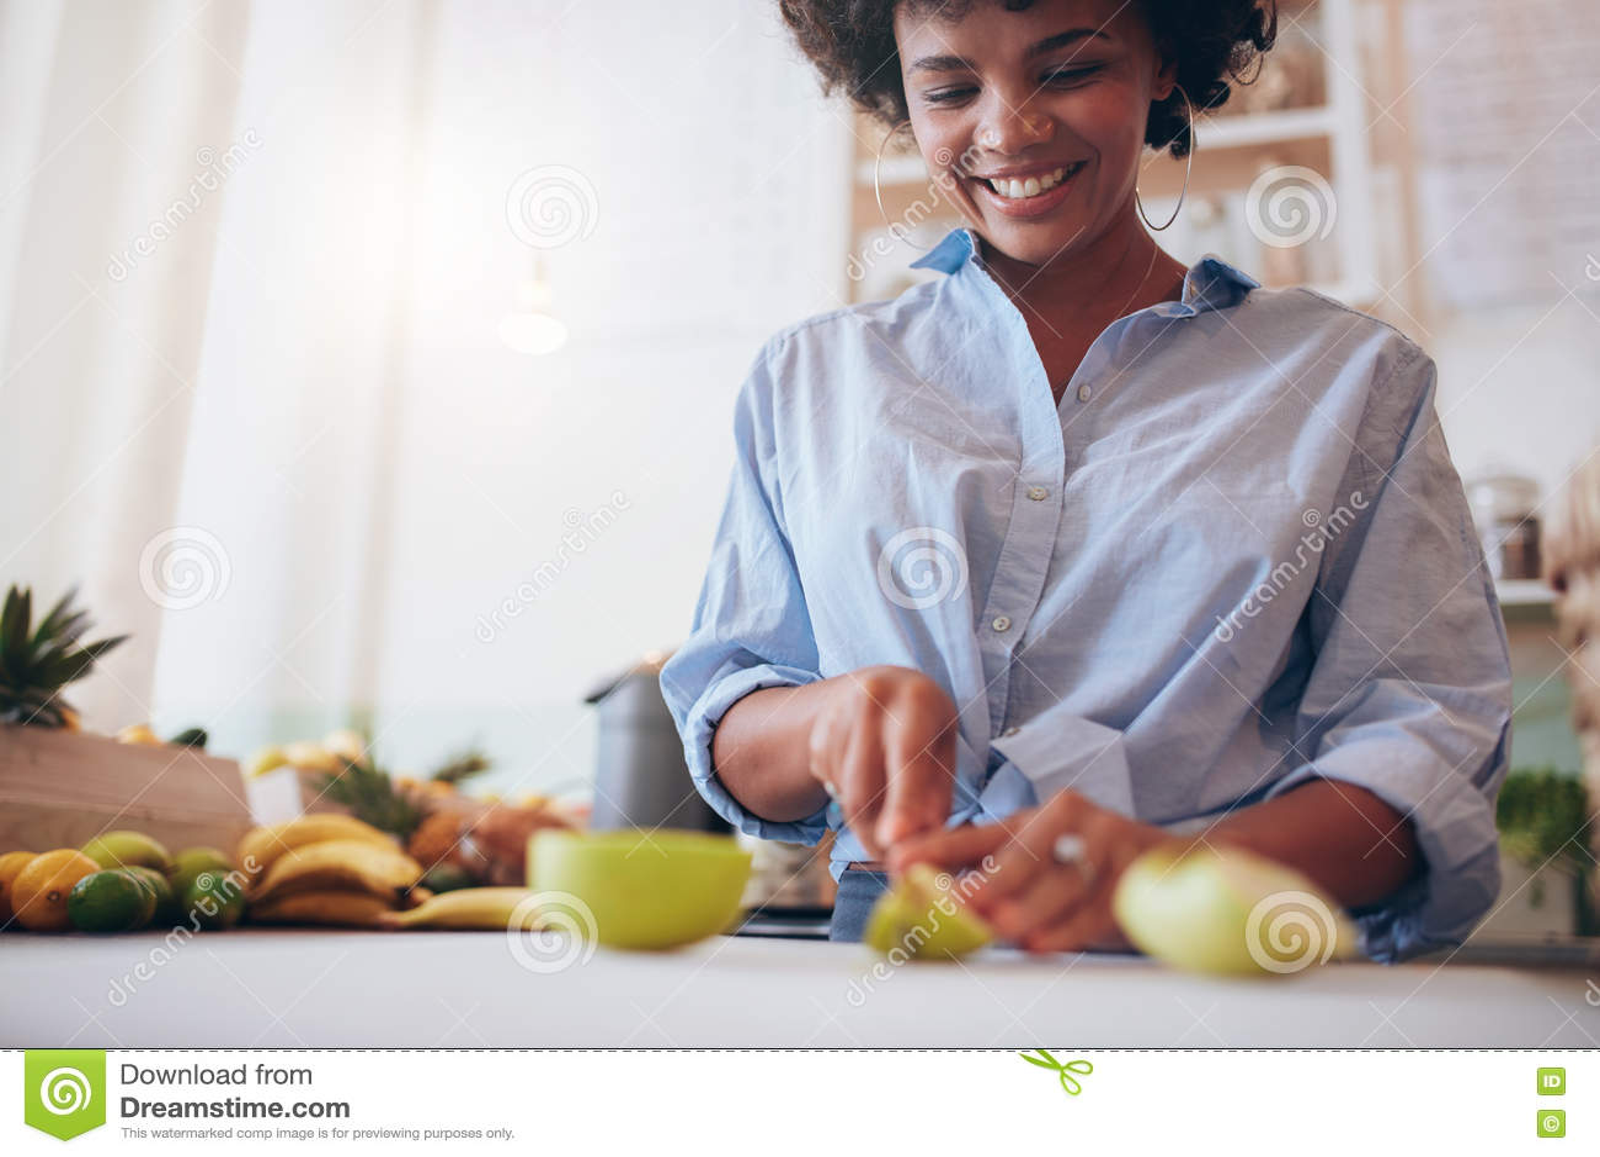 African woman preparing fresh fruit juice